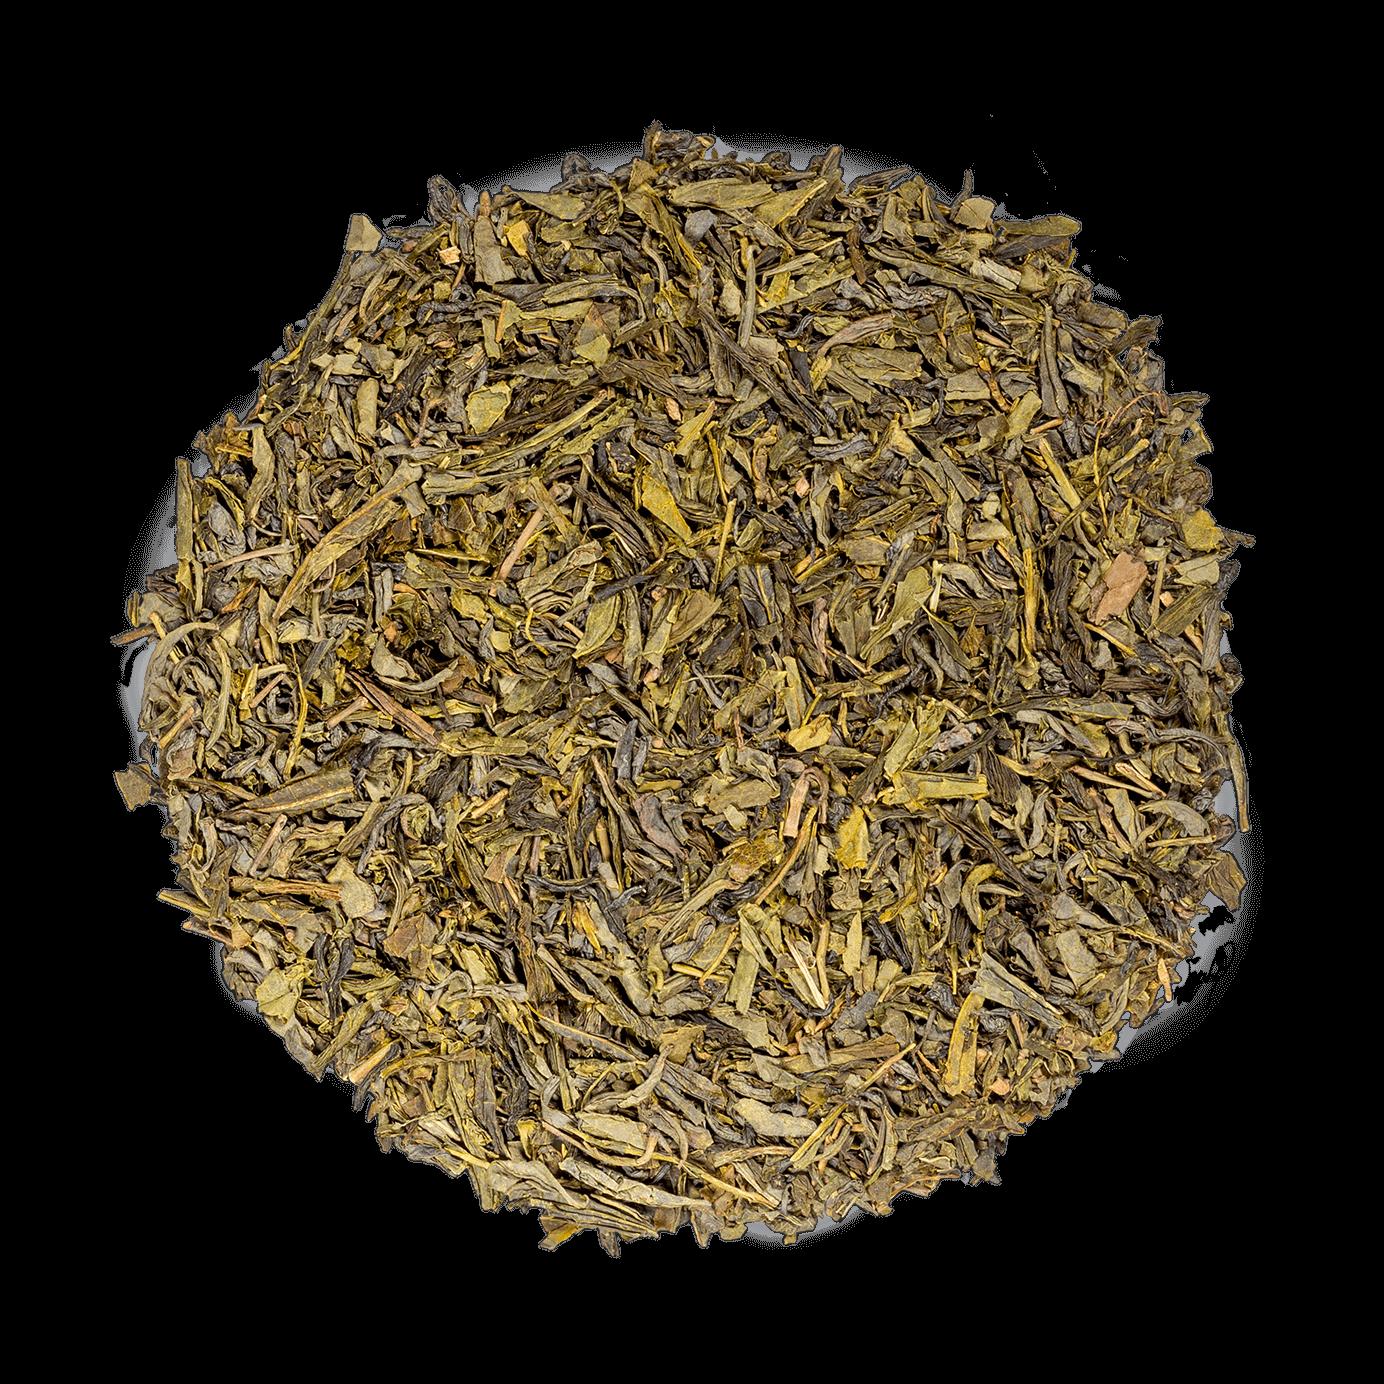 Vert rose bio - Thé vert à la rose - Thé en vrac - Kusmi Tea